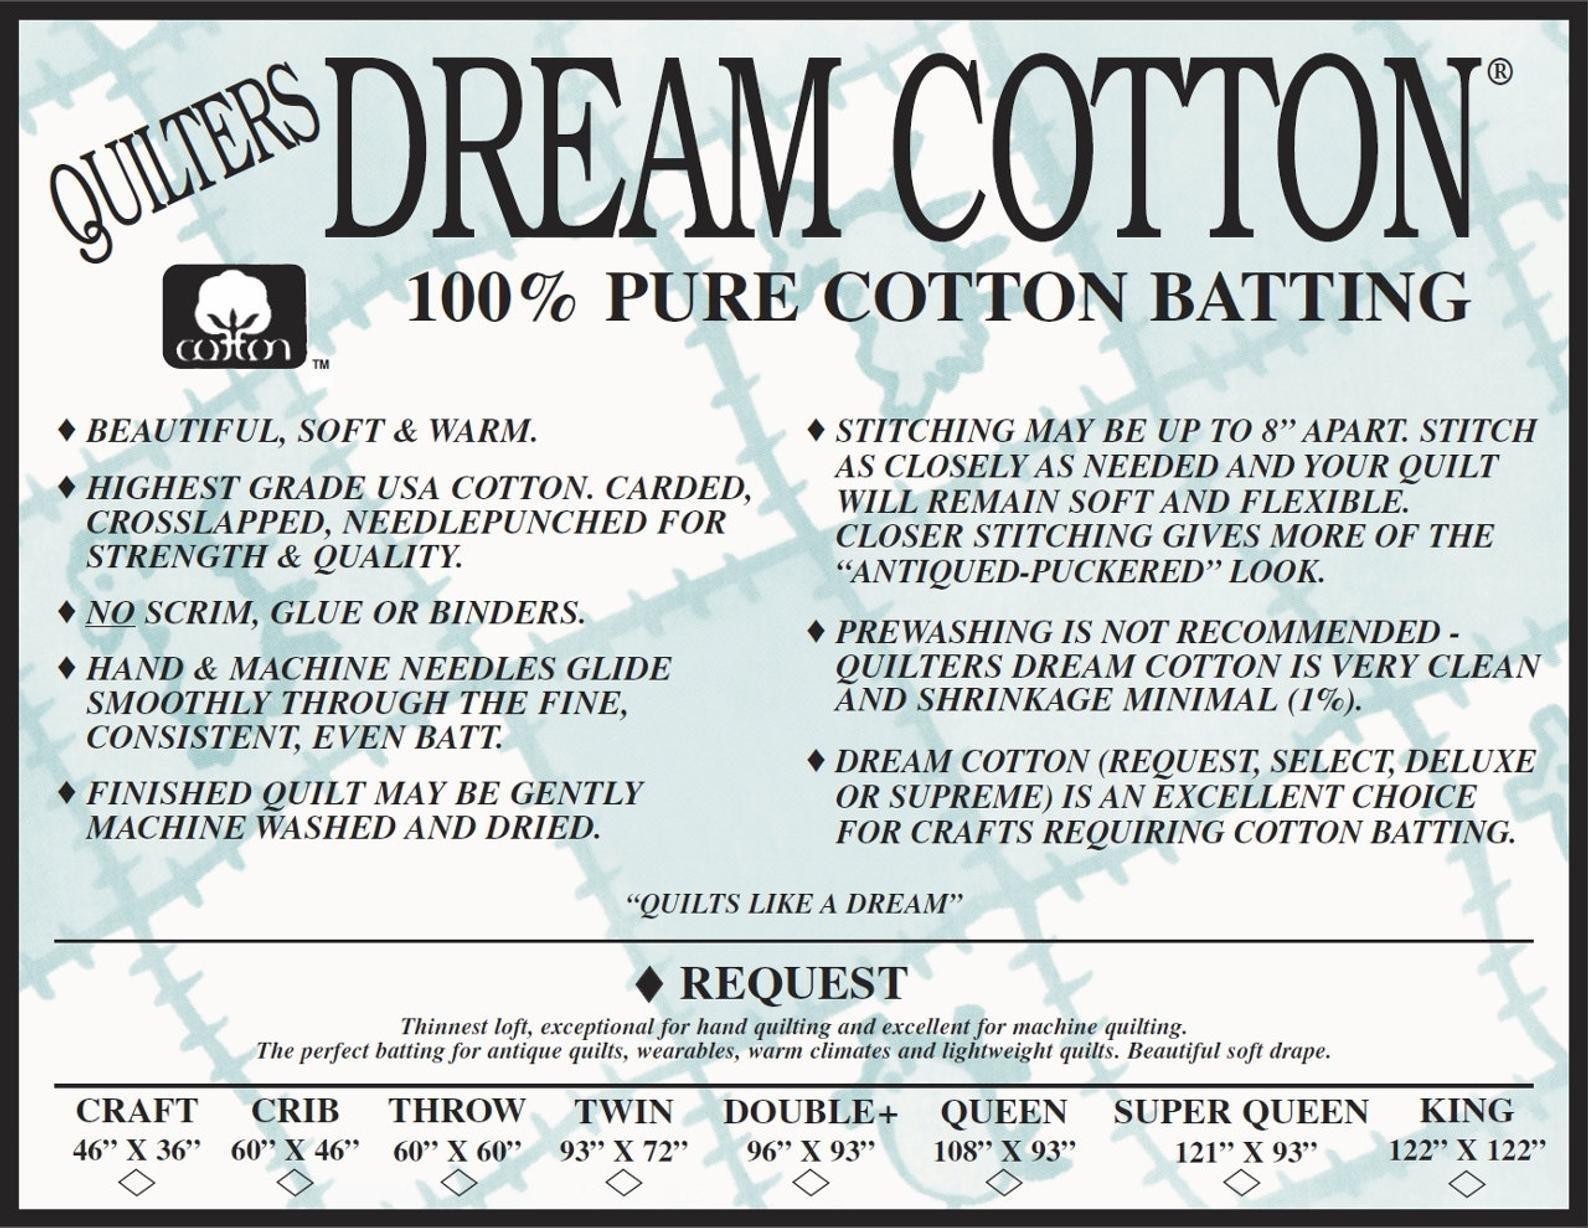 Dream Cotton QUEEN Natural Request 93 x 108